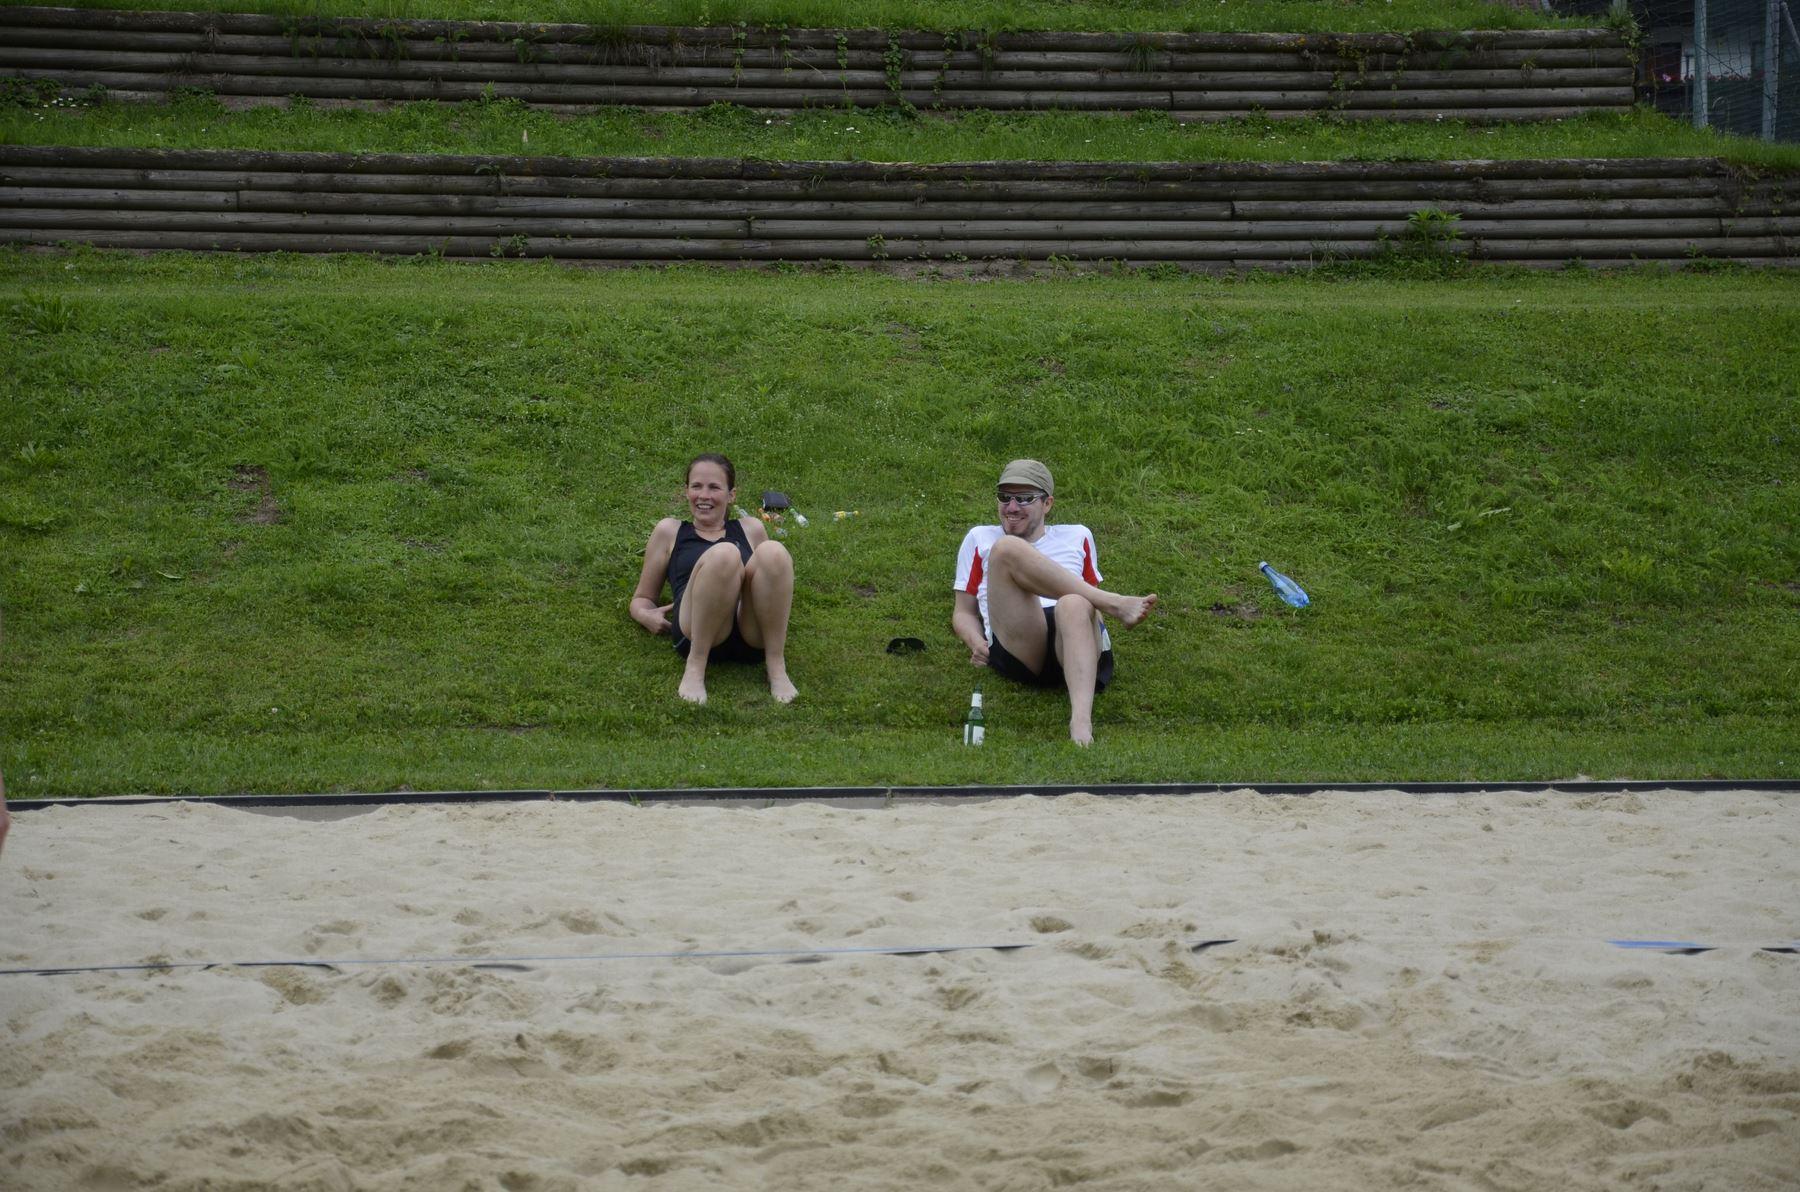 2016-07-02 Beachvolleyball 090